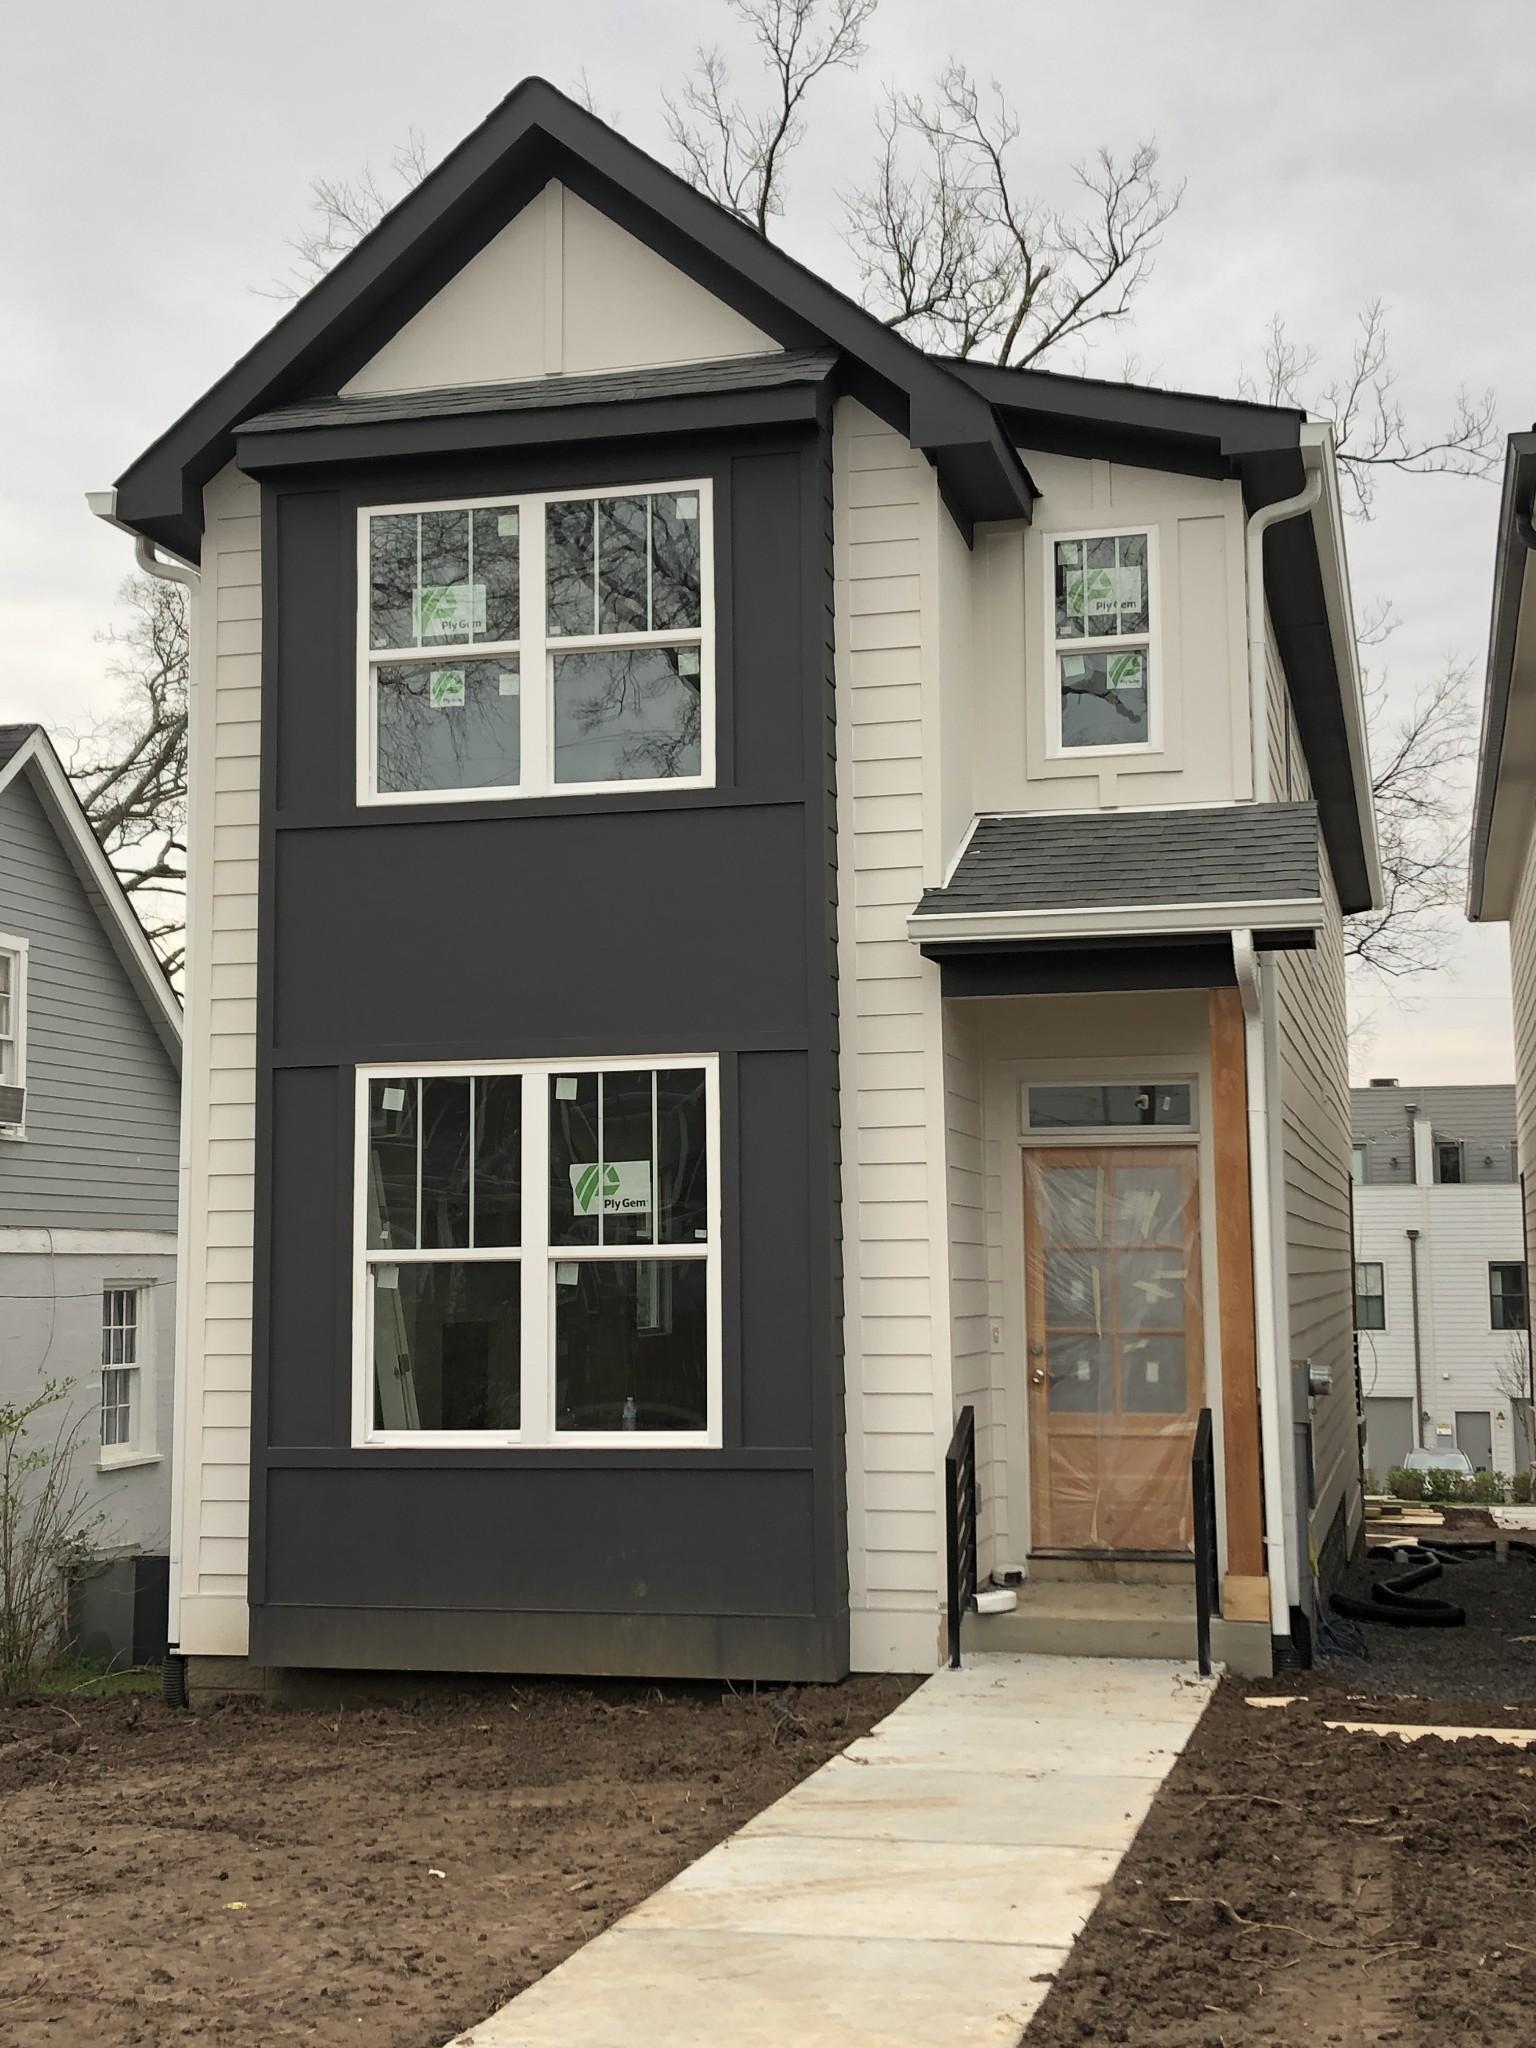 1068B Zophi St, Nashville, TN 37216 - Nashville, TN real estate listing